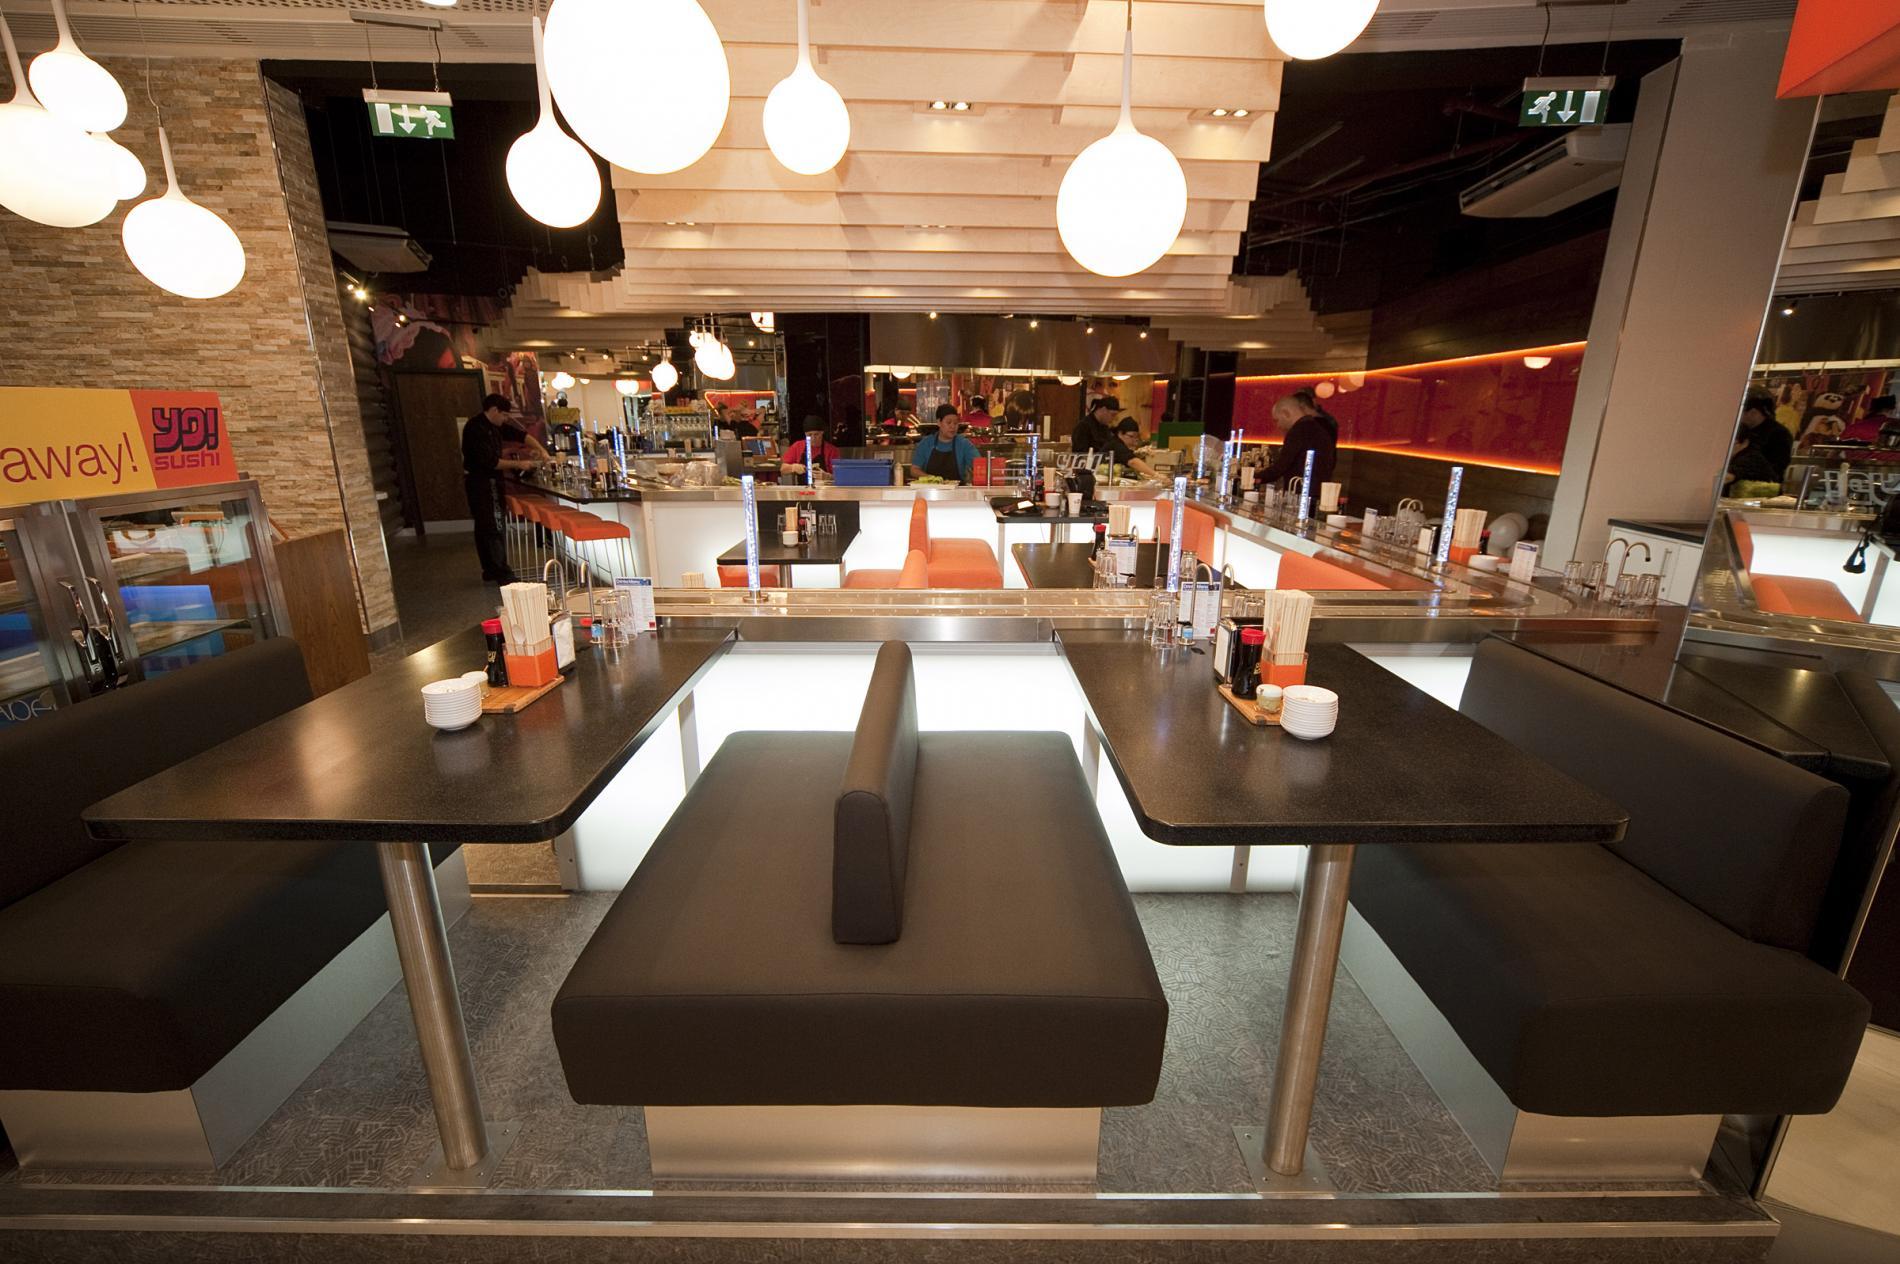 Unique dining at yo sushi bar aberdeen for Accord asian cuisine menu